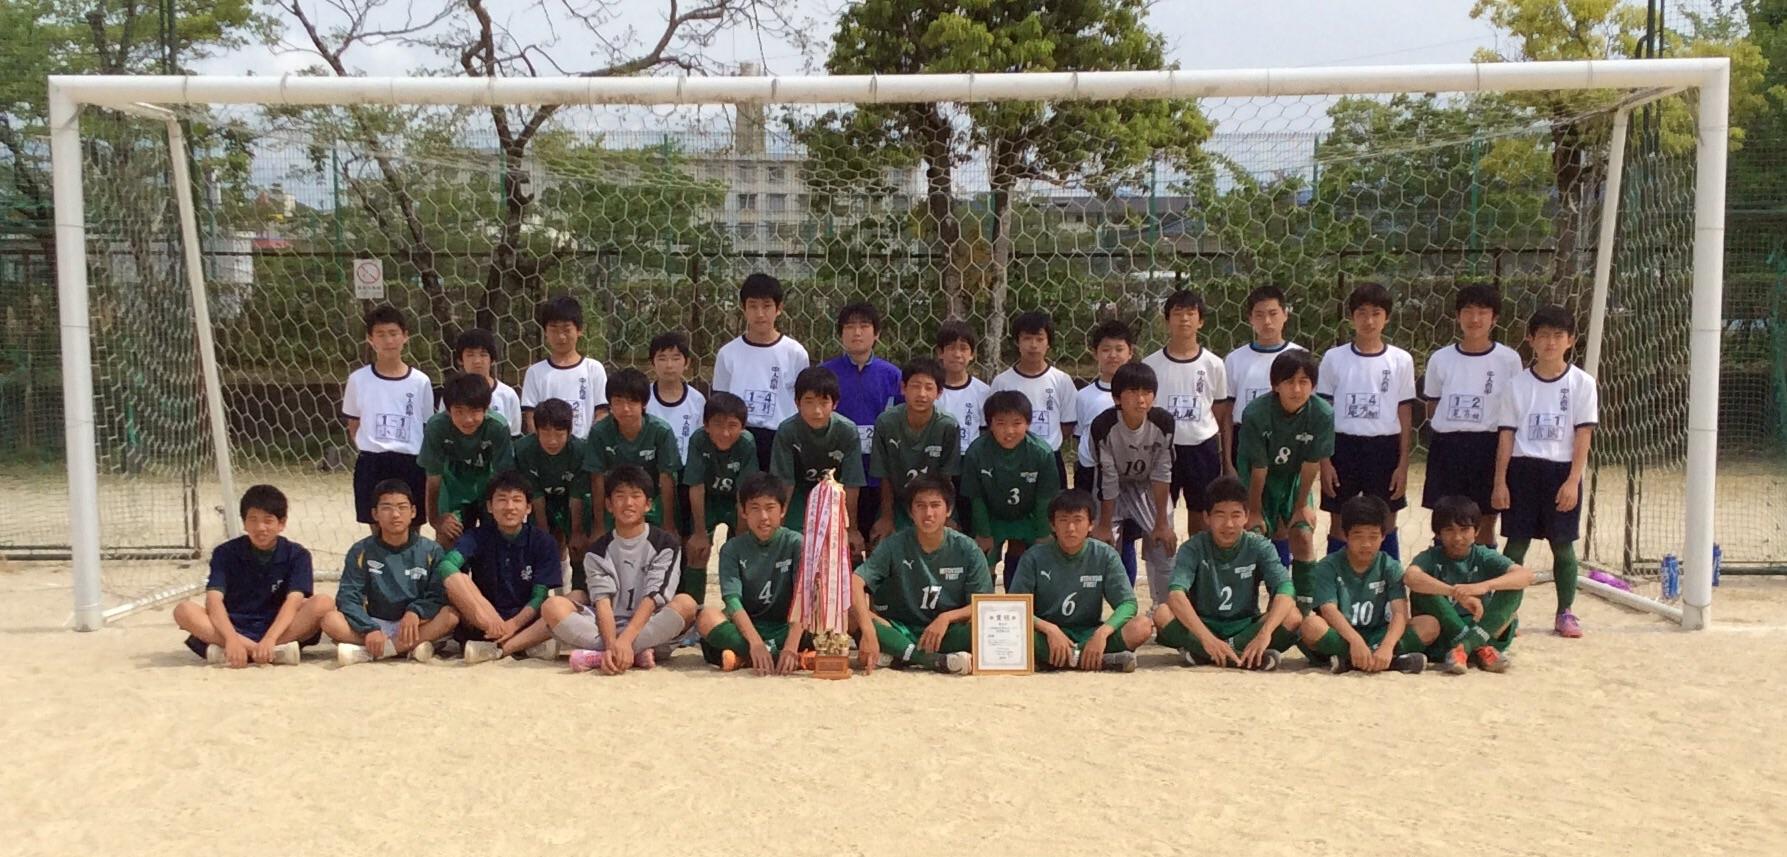 【人吉市】第23回人吉球磨中学生サッカー選手権大会を開催 ...